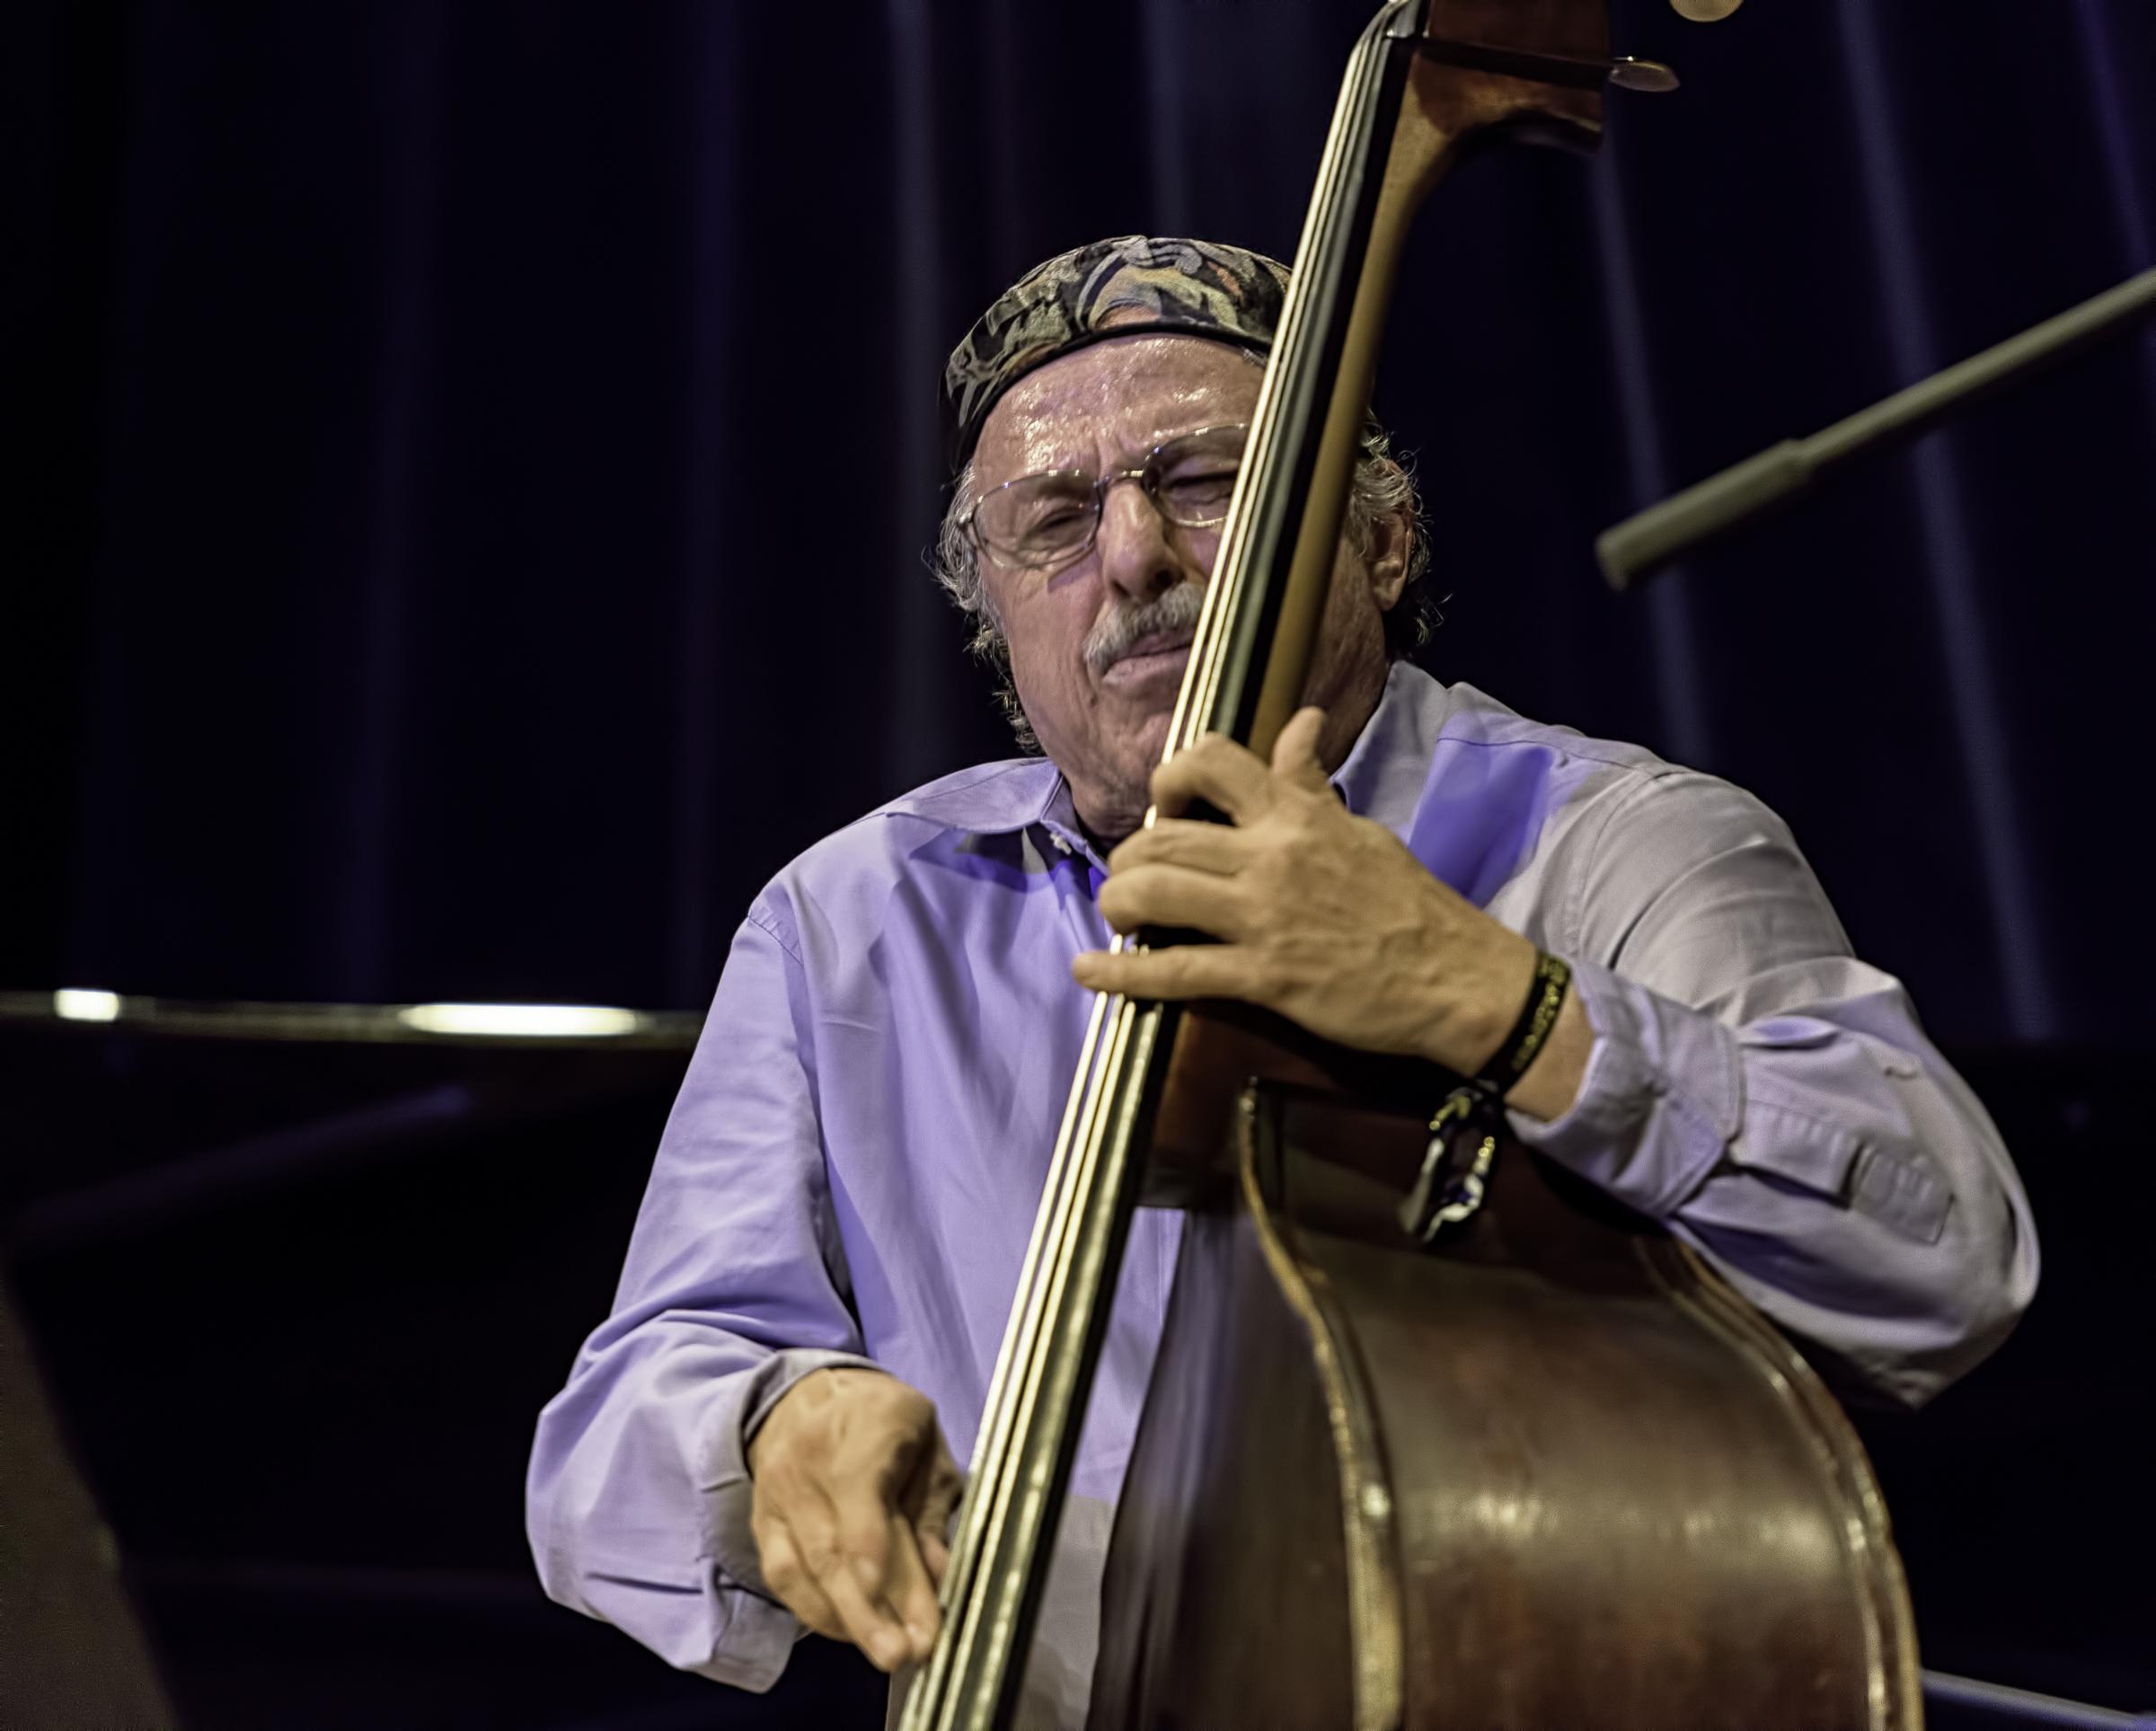 Joe Fonda With Ogjb Quartet At The Nyc Winter Jazzfest 2016